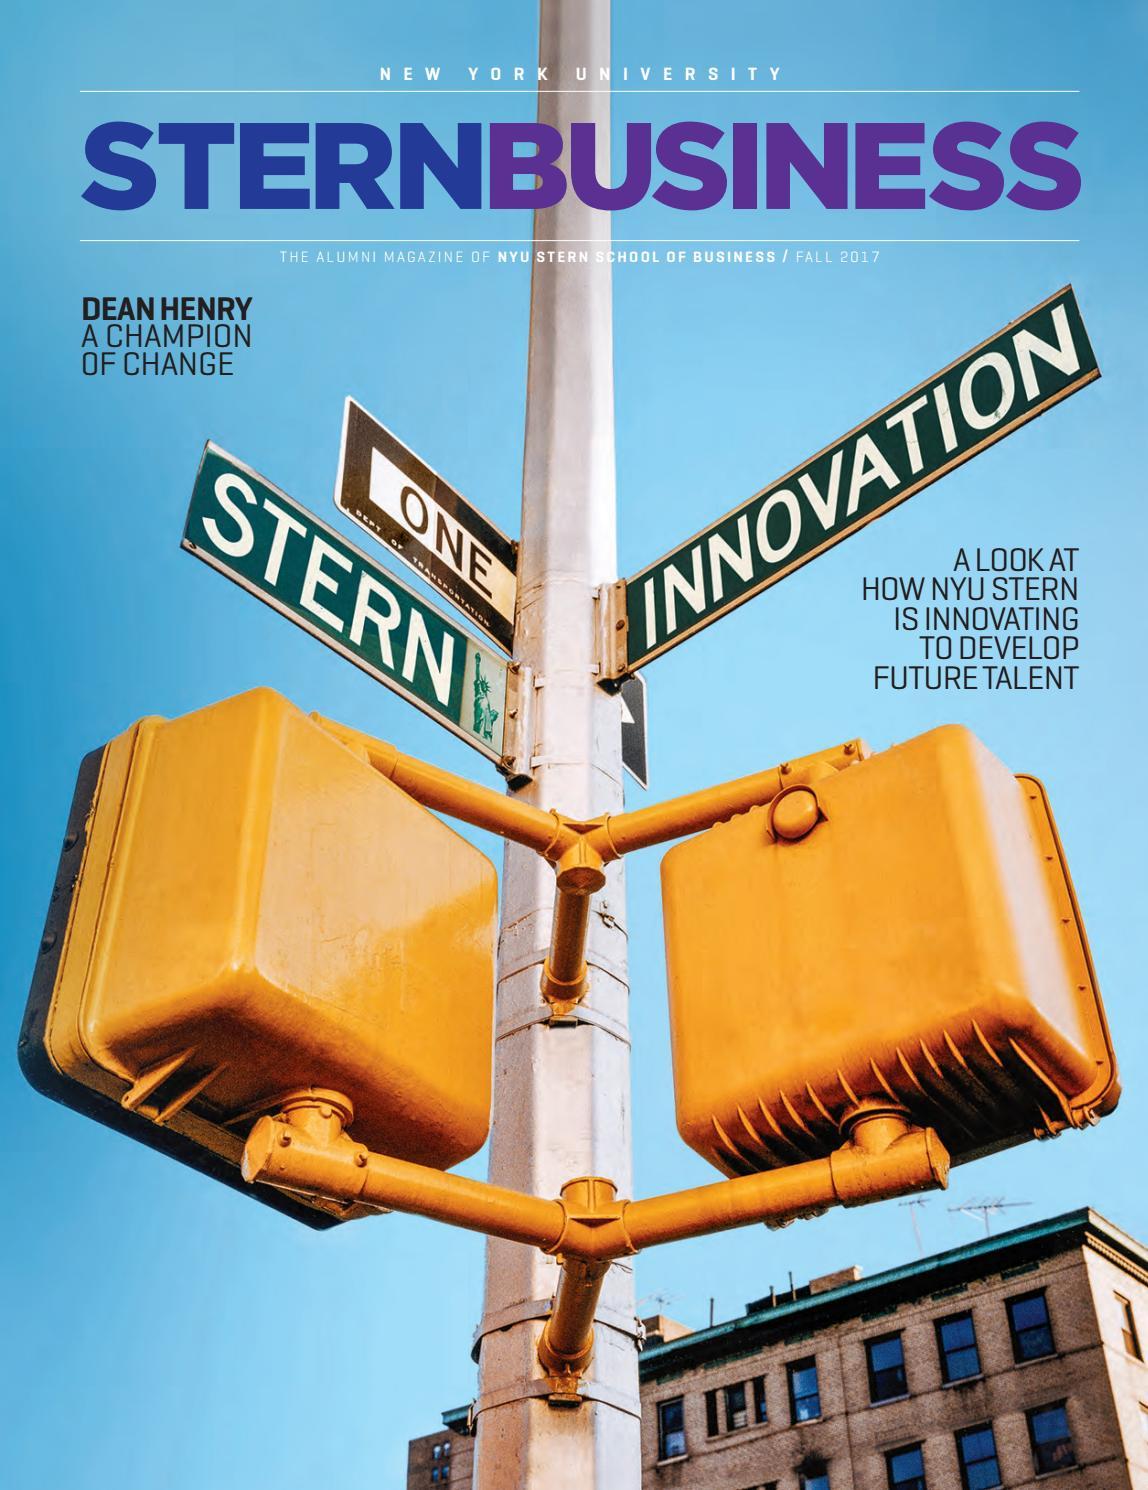 Sternbusiness Fall 2017 By Nyu Stern Issuu